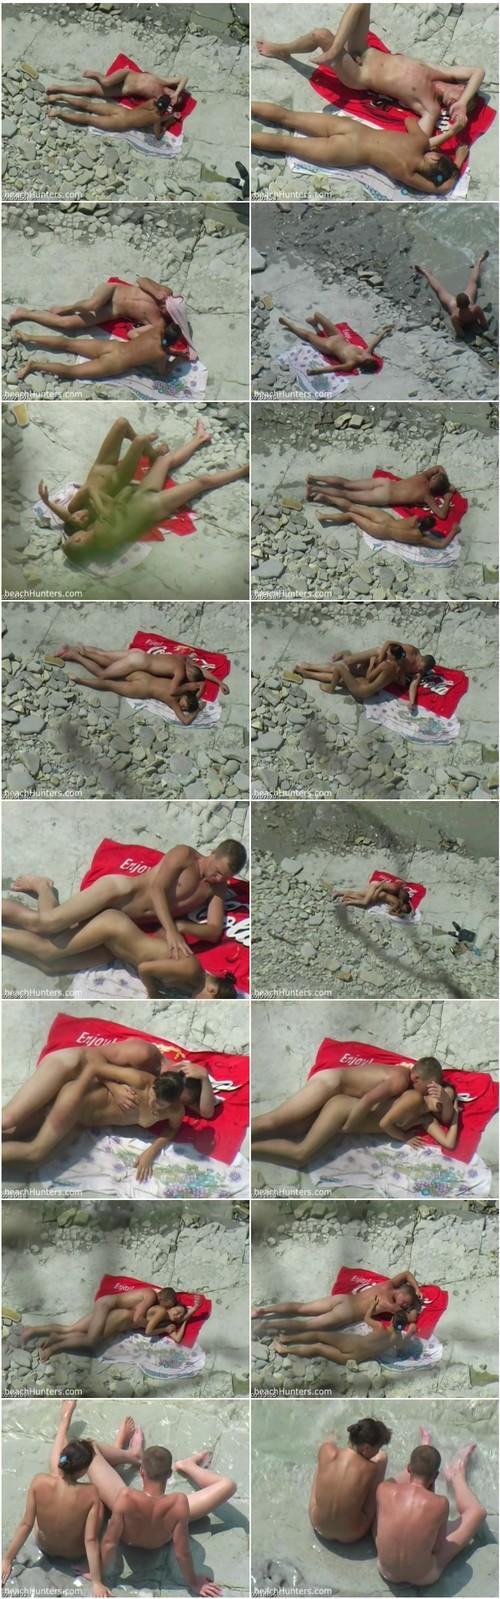 beachhunters-m0901_thumb_m.jpg